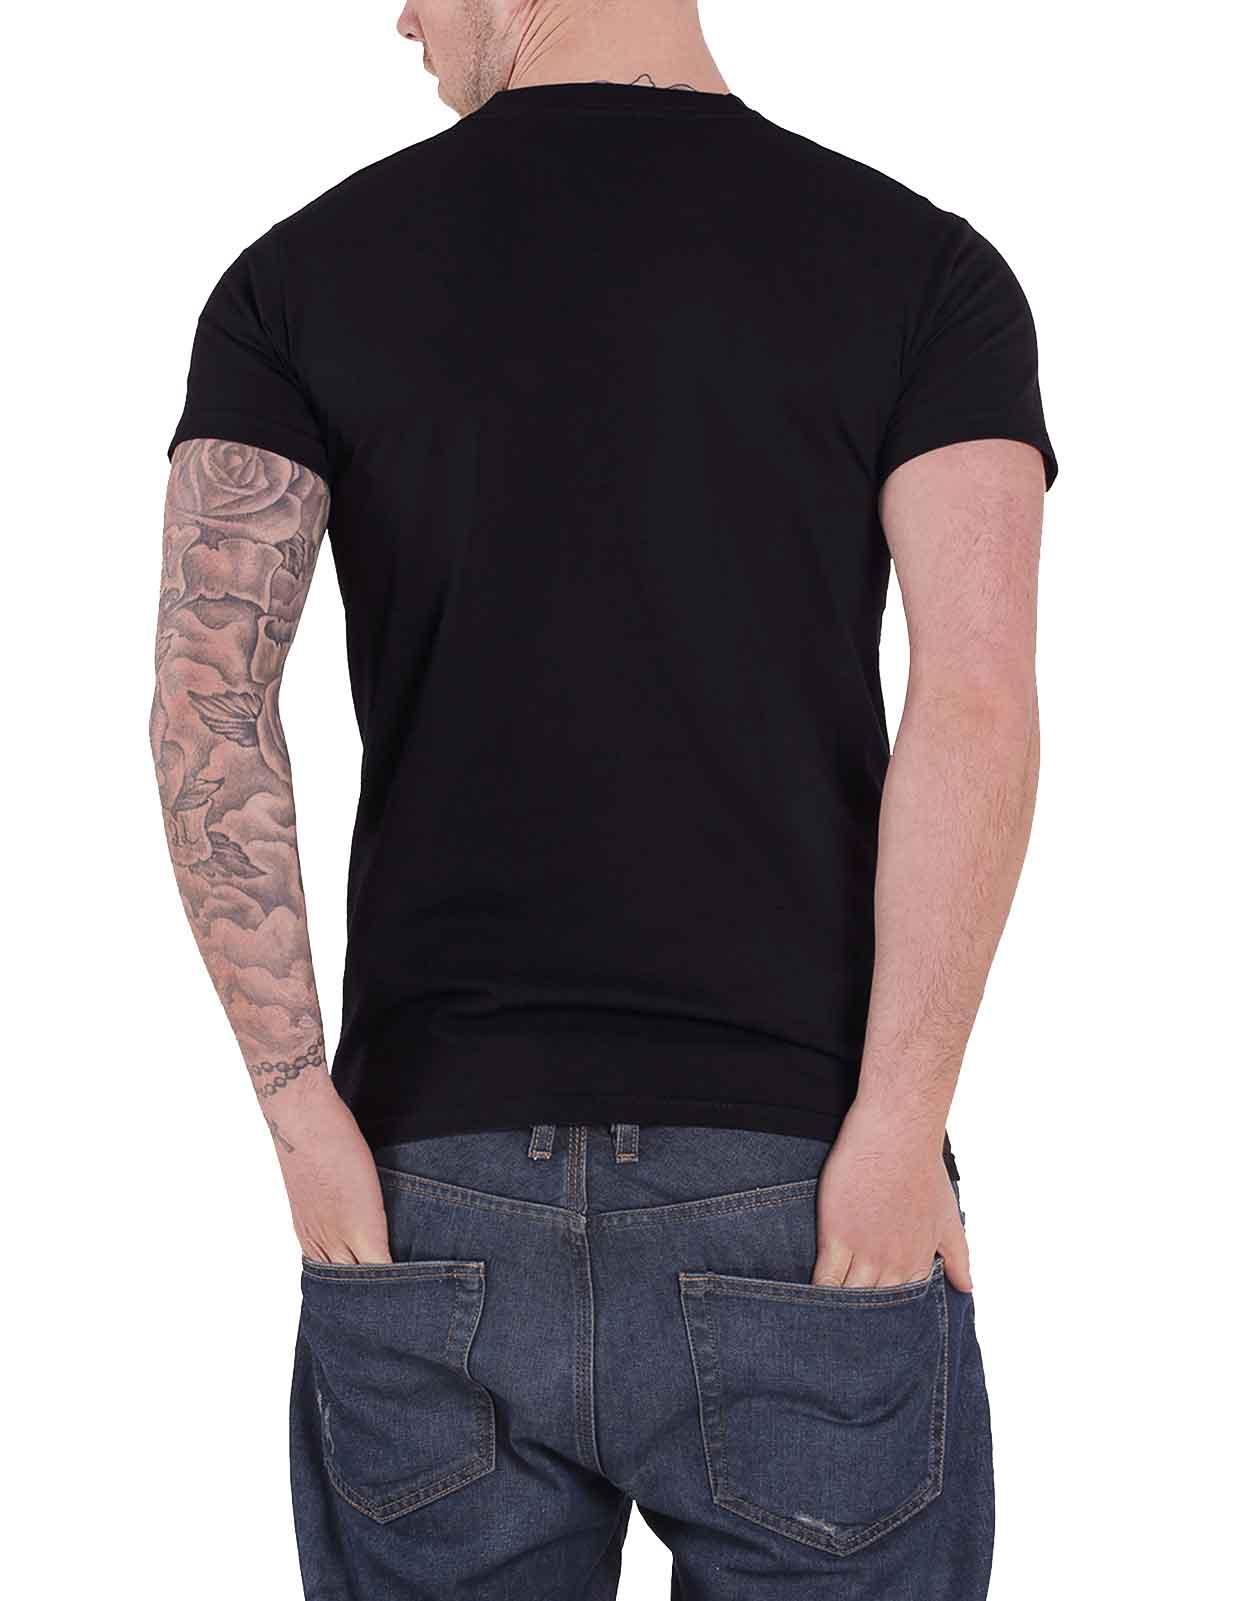 Motorhead-T-Shirt-Lemmy-RIP-England-warpig-clean-your-clock-official-new-mens Indexbild 37